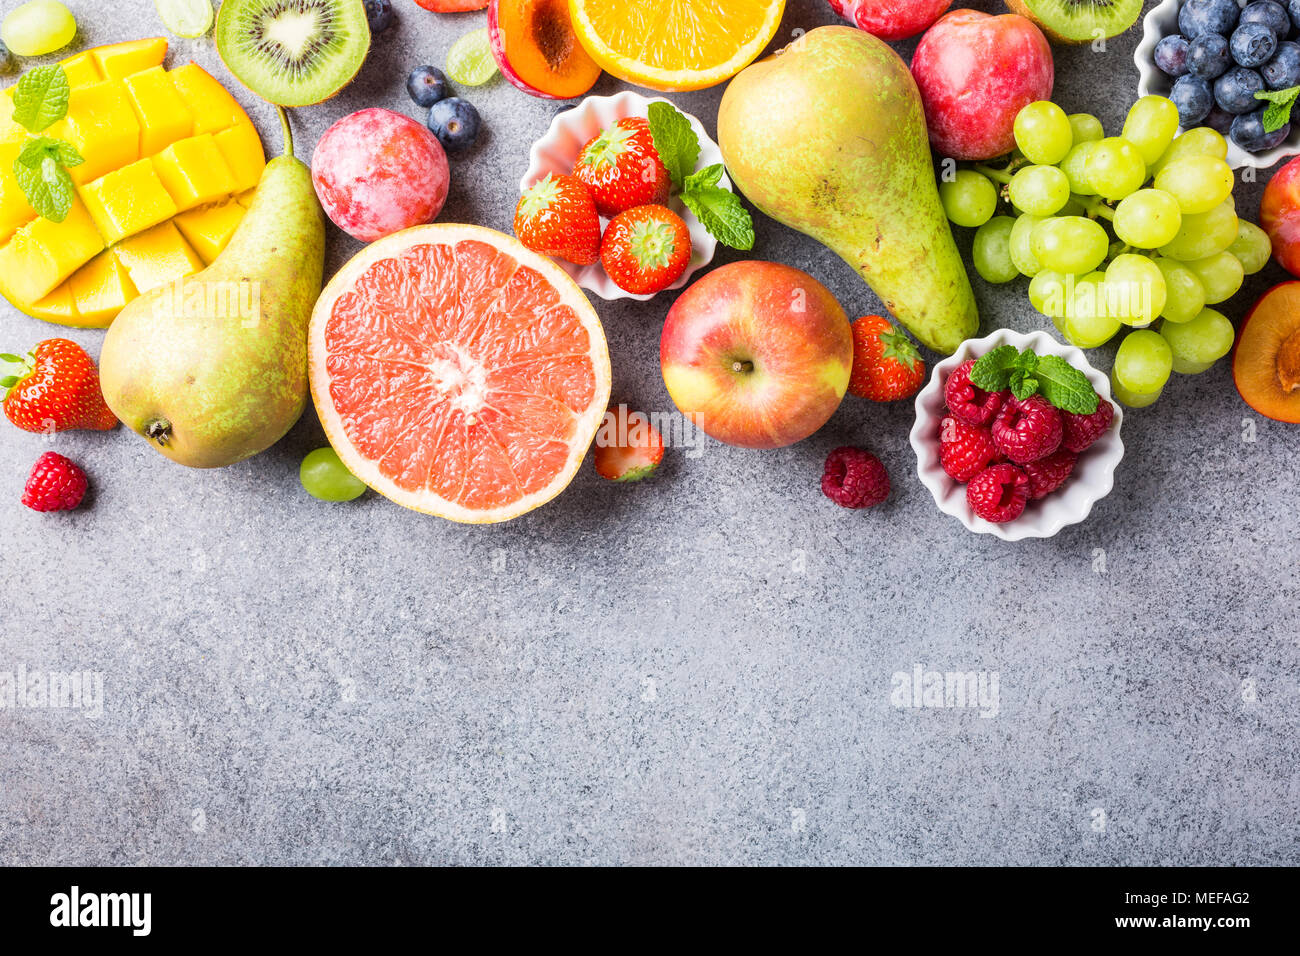 Freschi frutti assortiti e bacche Immagini Stock